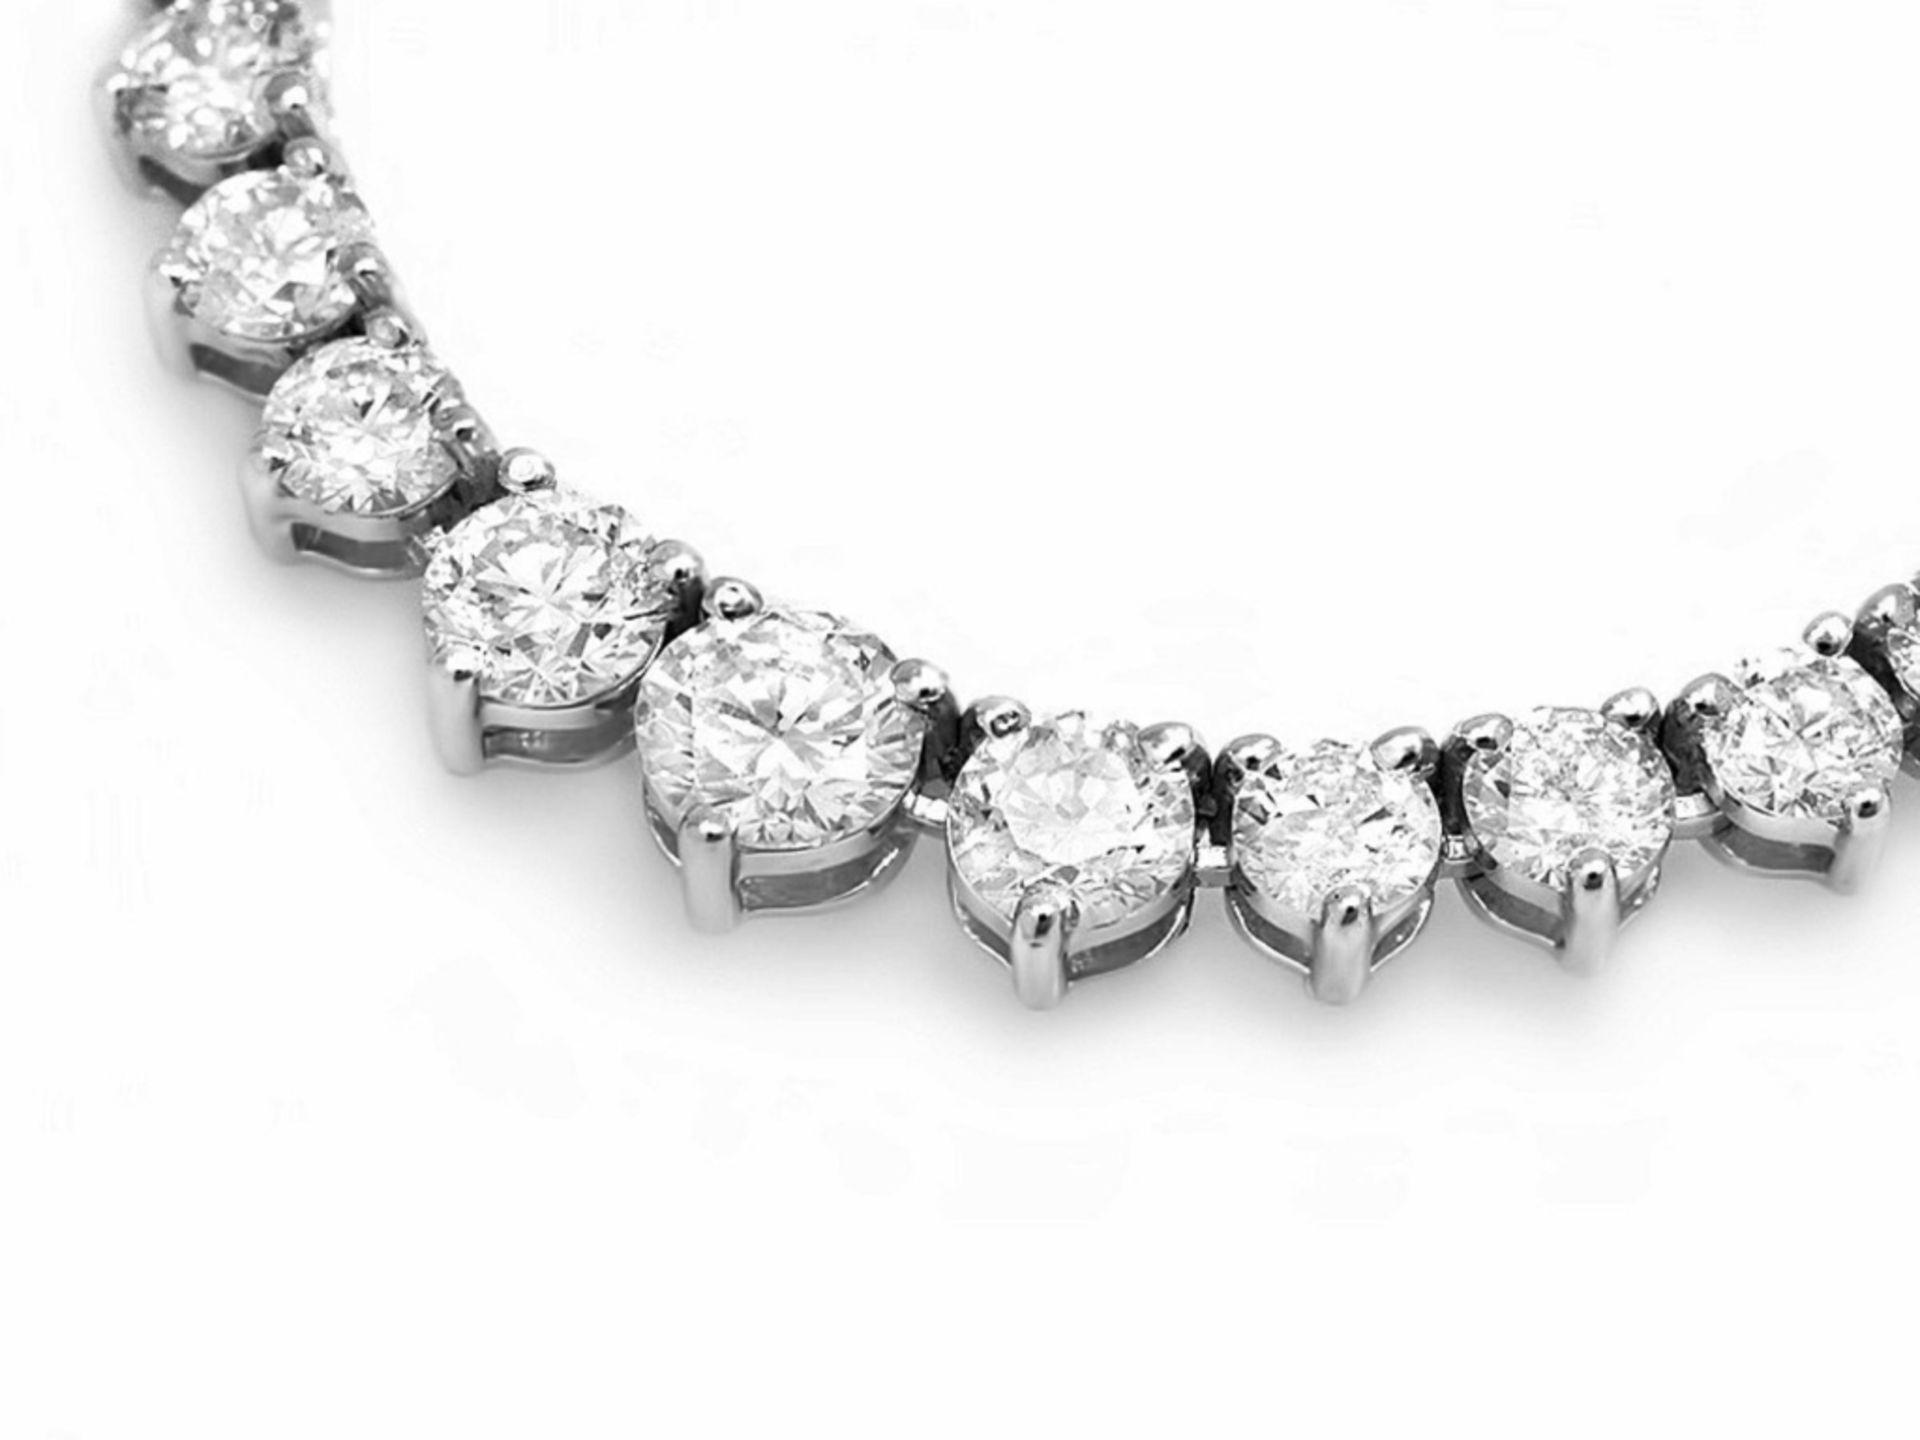 ^18k White Gold 10.00ct Diamond Necklace - Image 3 of 5